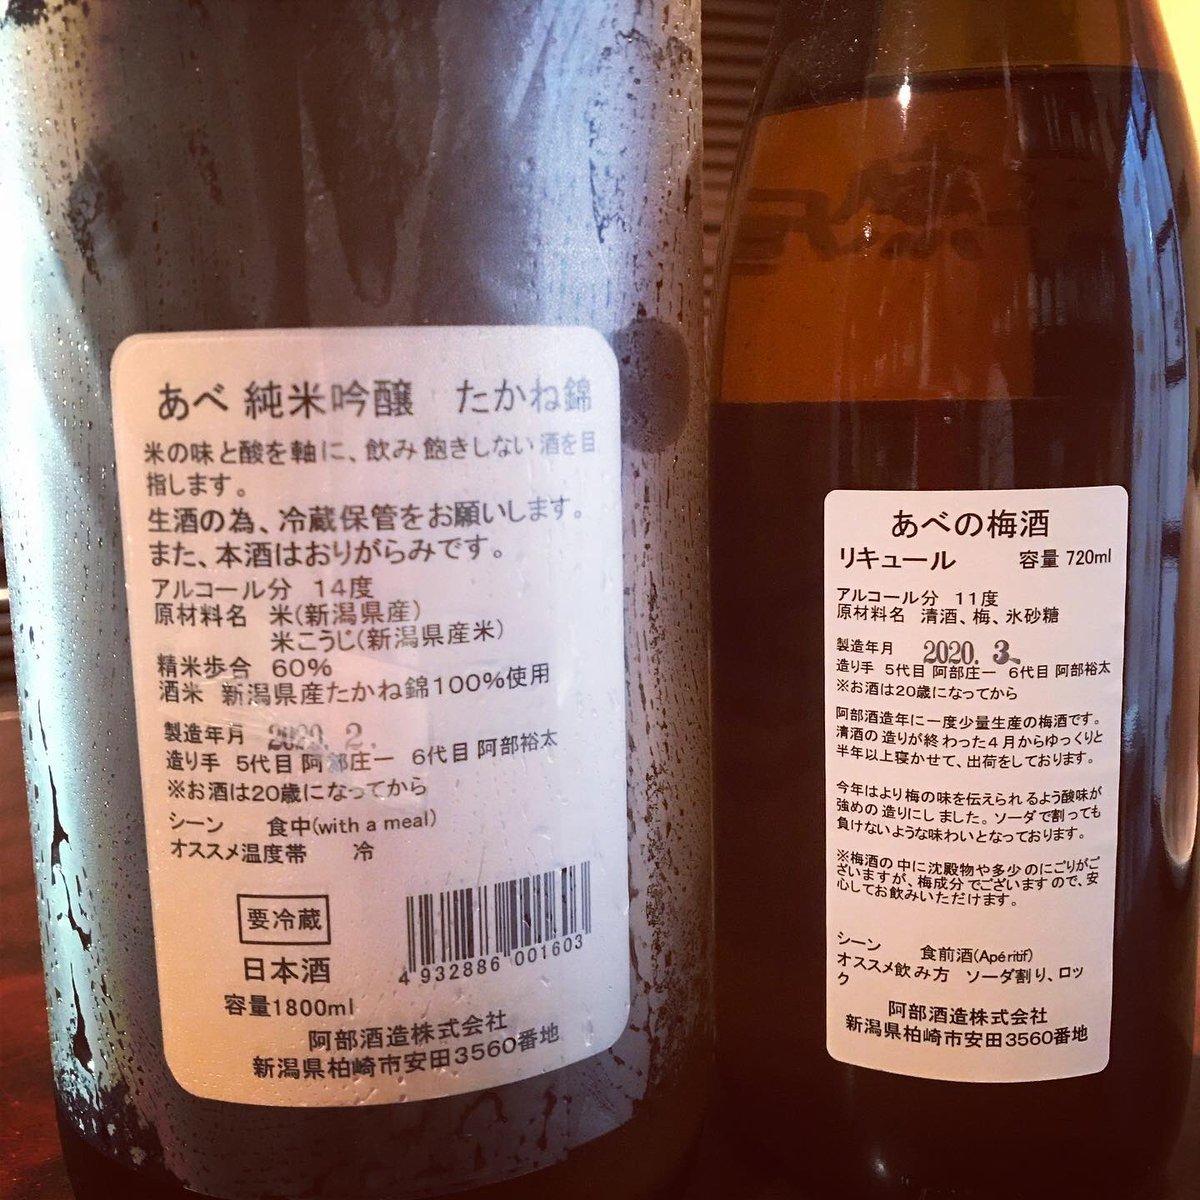 test ツイッターメディア - 5/23(土)は 16時半〜22時閉店とさせていただきます  新潟県柏崎市 阿部酒造さん 「あべ」純米吟醸たかね錦ピンクおりがらみ生酒 あべシリーズは全て原酒タイプとなり 初回ロットのvol.1のみおりがらみ生タイプです 「あべの梅酒」 中止になった にいがた酒の陣2020限定酒として1年熟成された梅酒です https://t.co/mrOvp5ZRIF